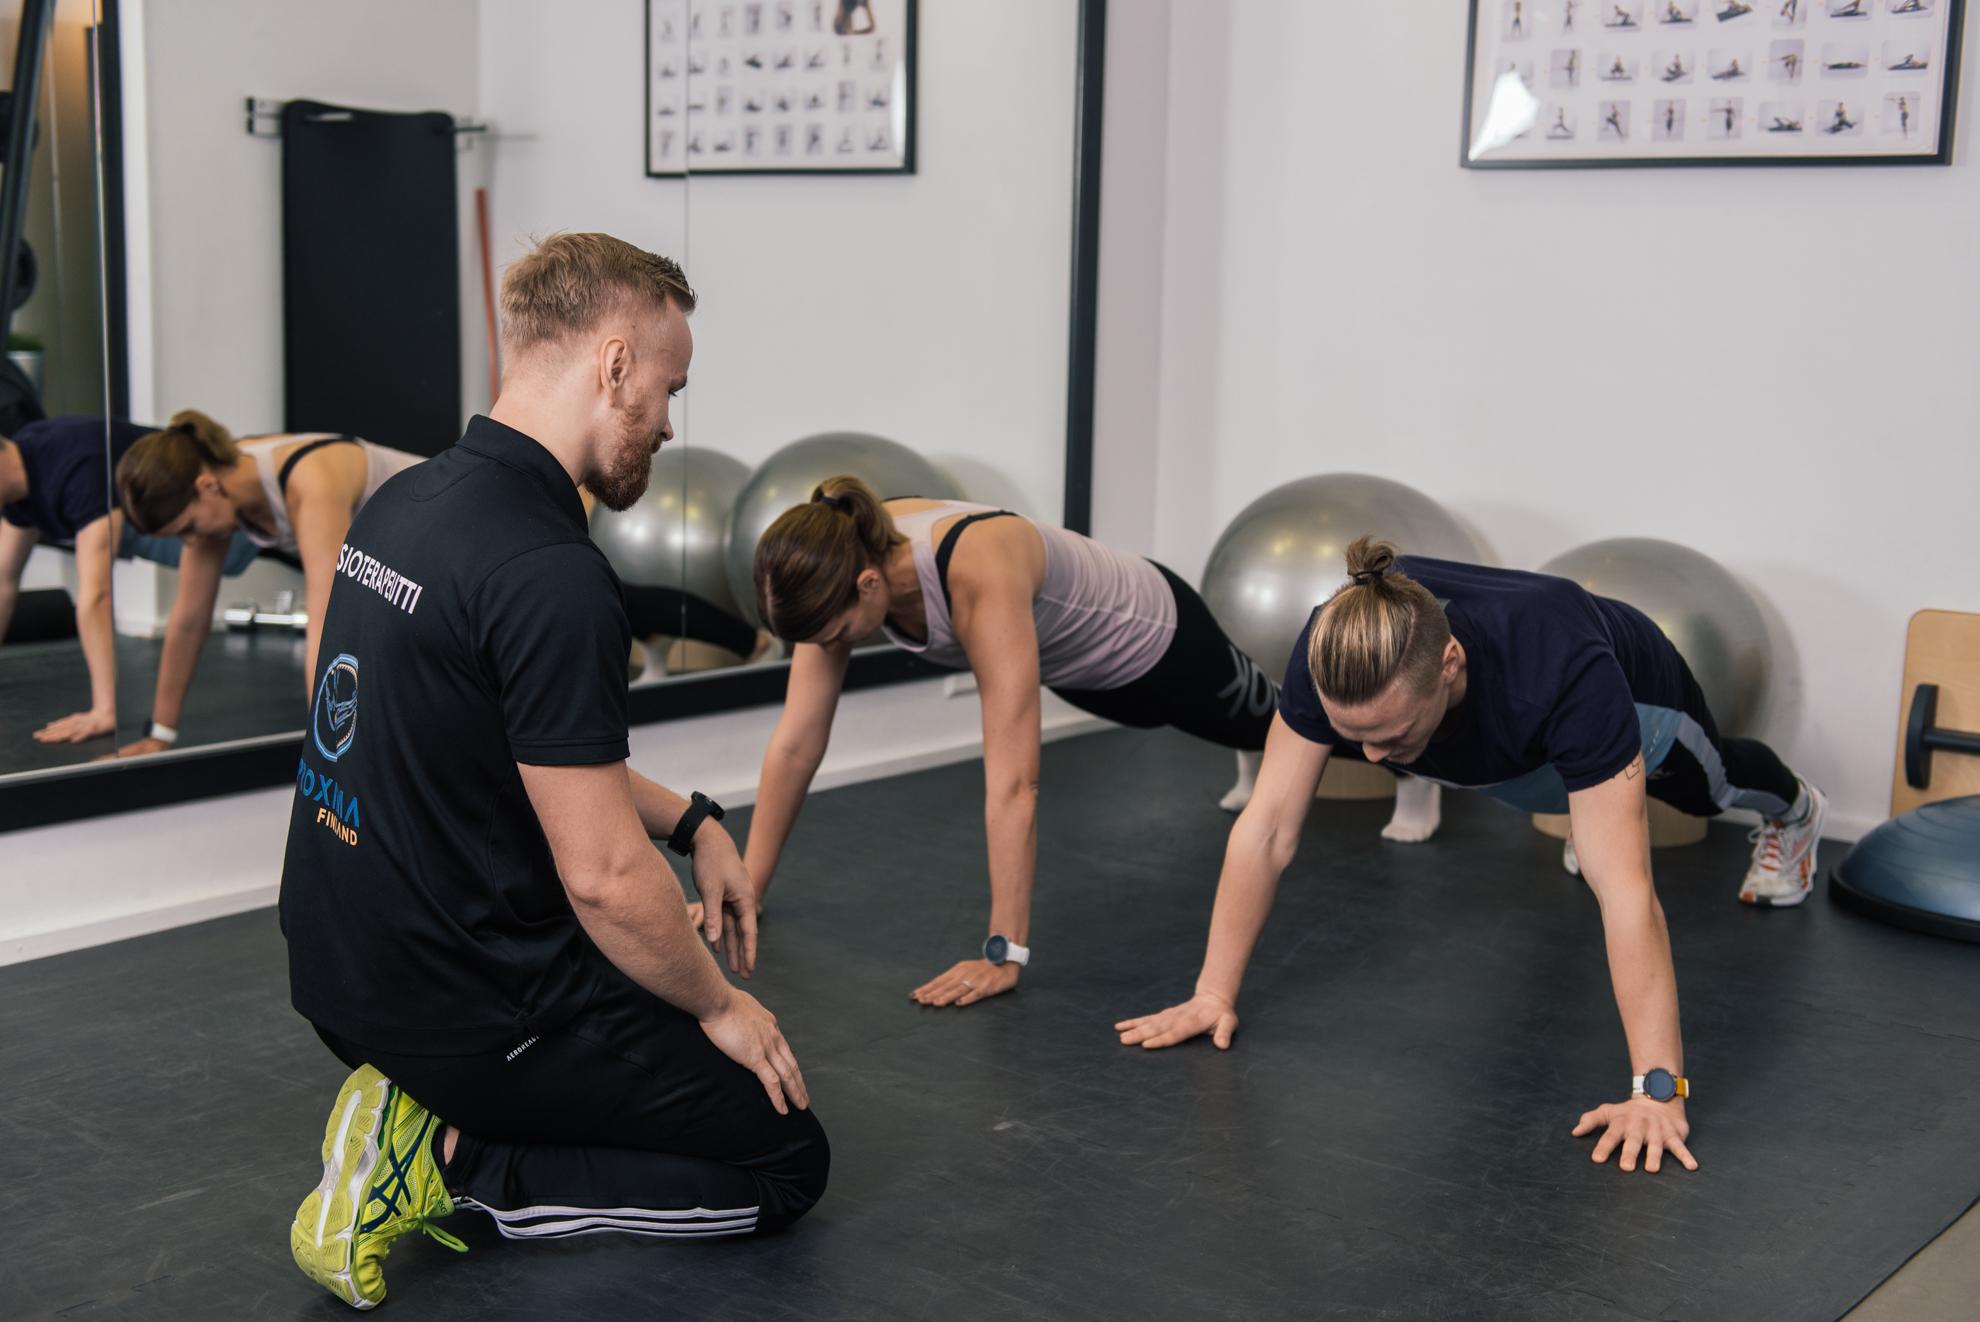 personal training Fysioterapia-hieronta-urheiluhieronta-äitiysfysitoerapia-fysio-omt fysioterapia-